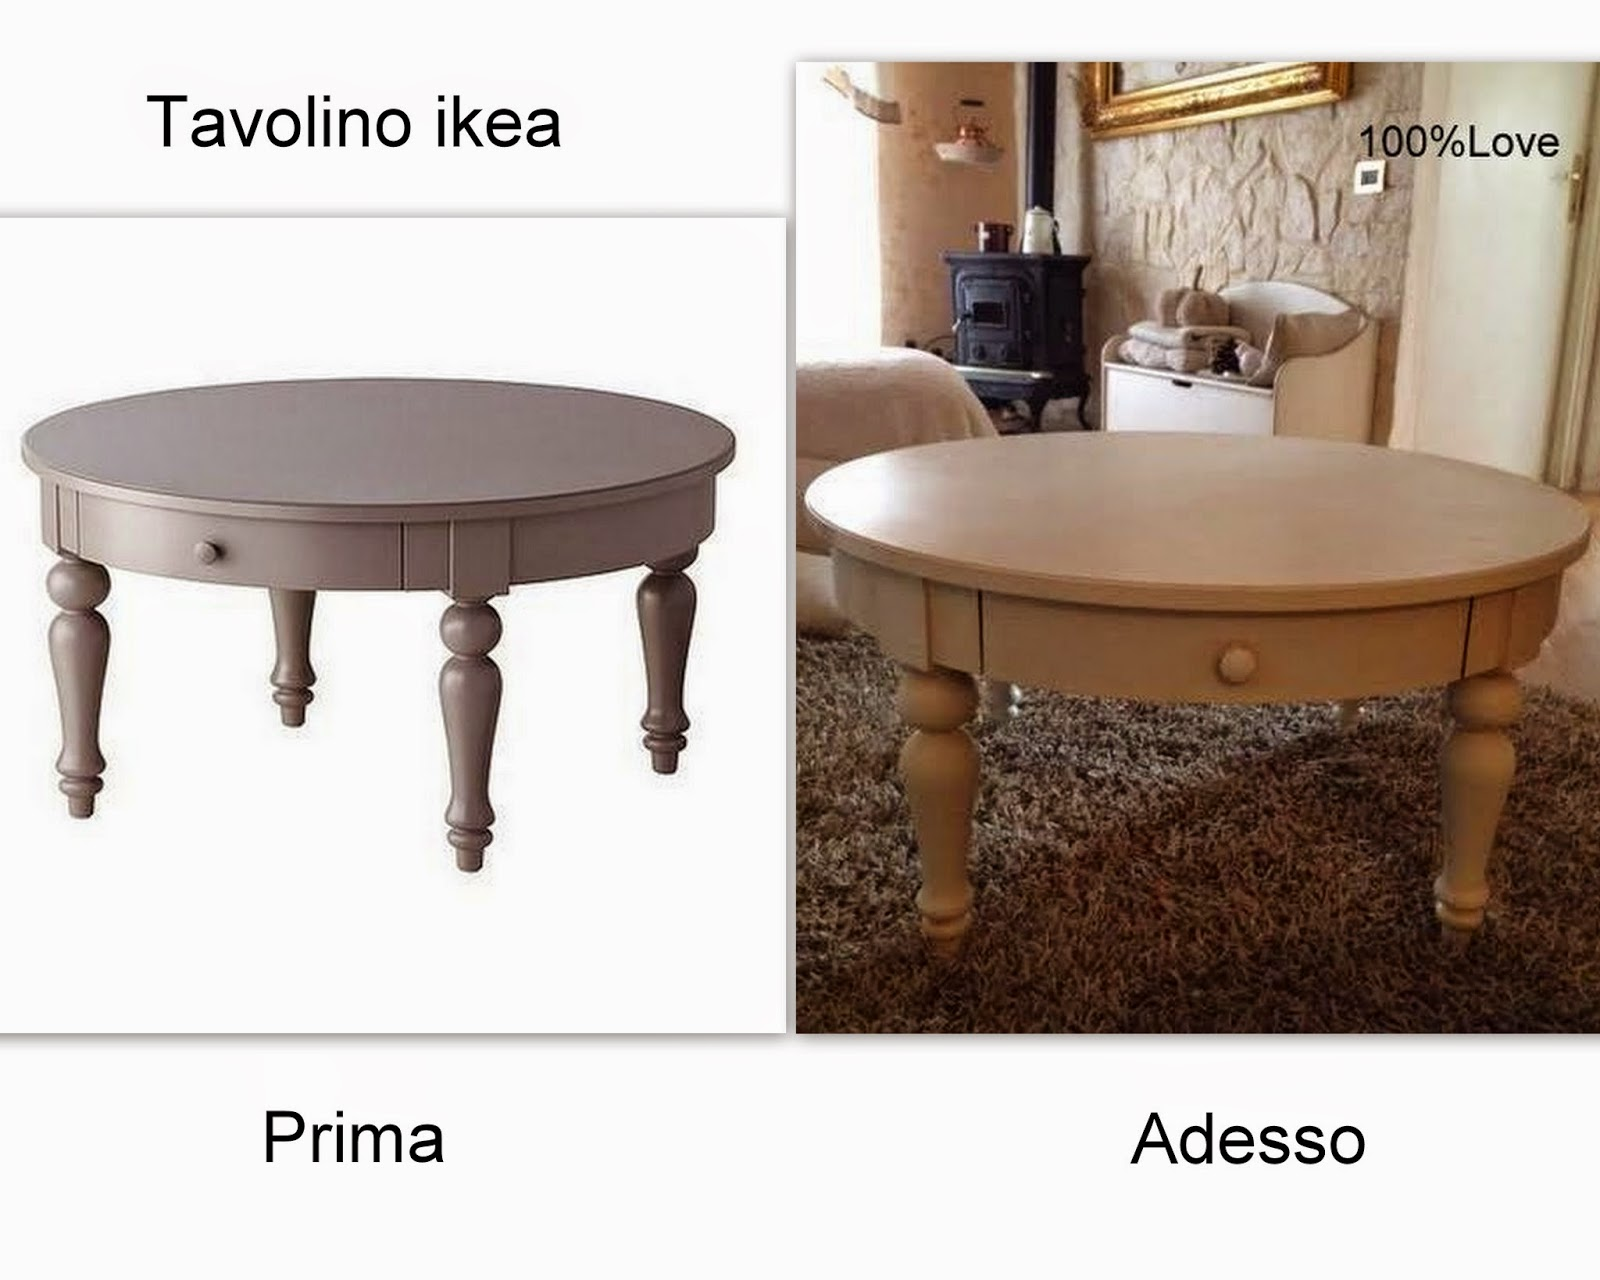 100%LOVE: Tavolino ikea ...?